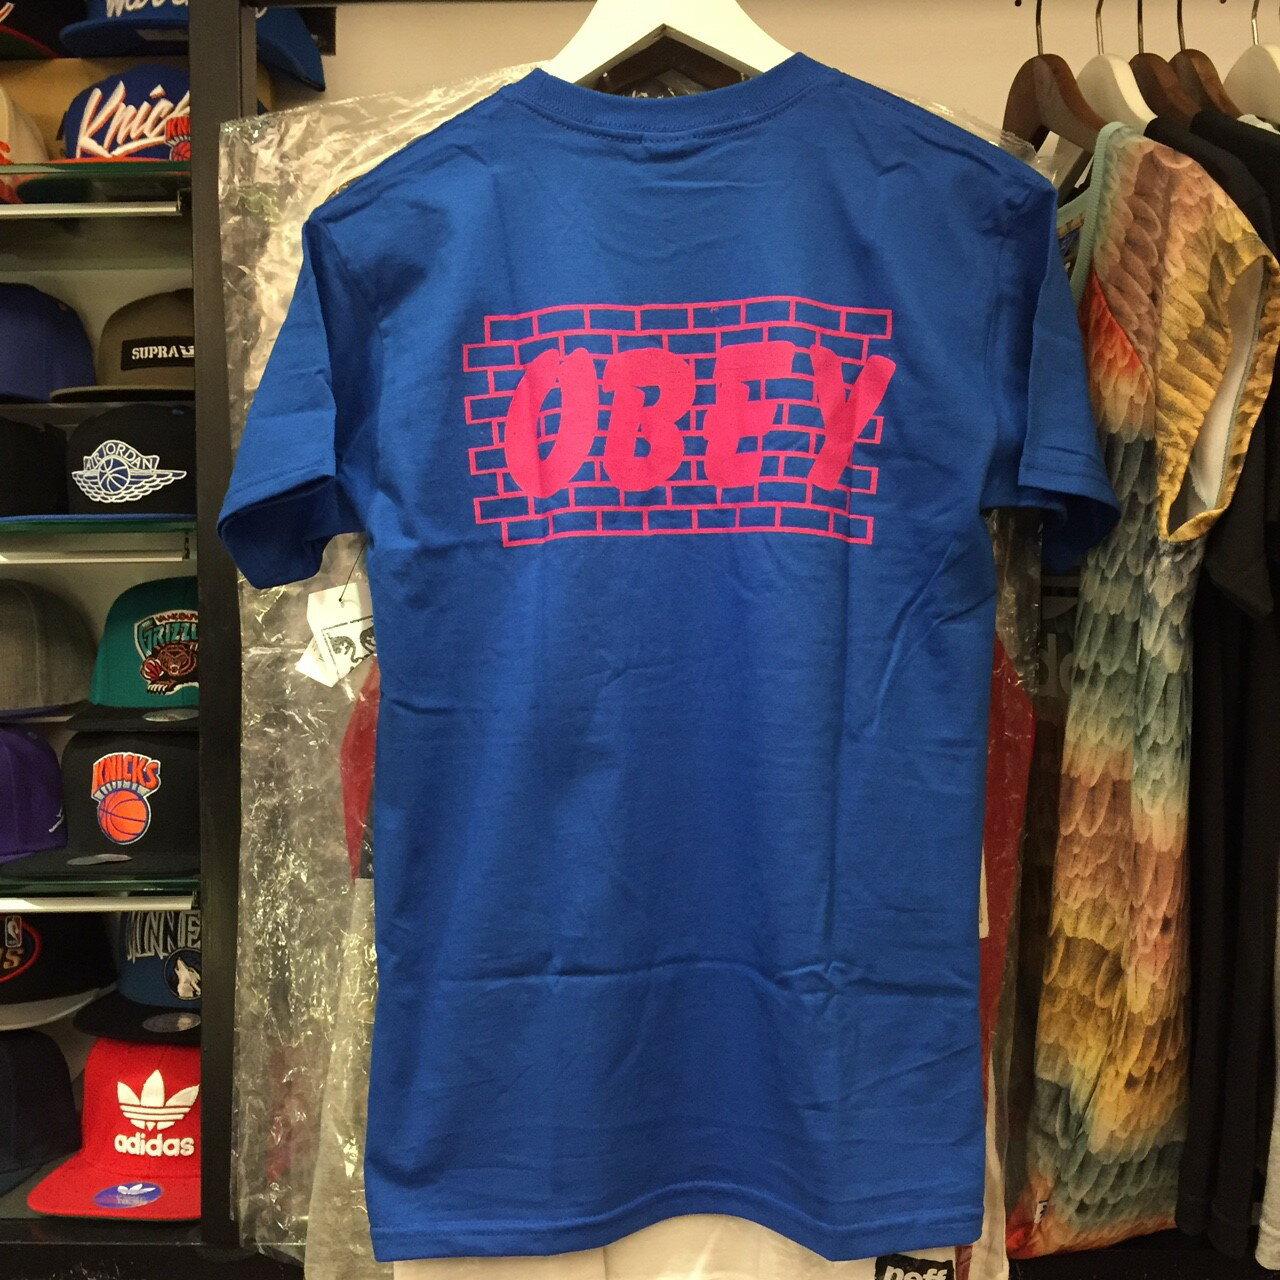 BEETLE PLUS 西門町經銷 全新 美國品牌 OBEY BRICK WALL TEE 磚牆 寶藍 白字 藍白 LOGO 短T TEE 163081179ROY OB-419 2